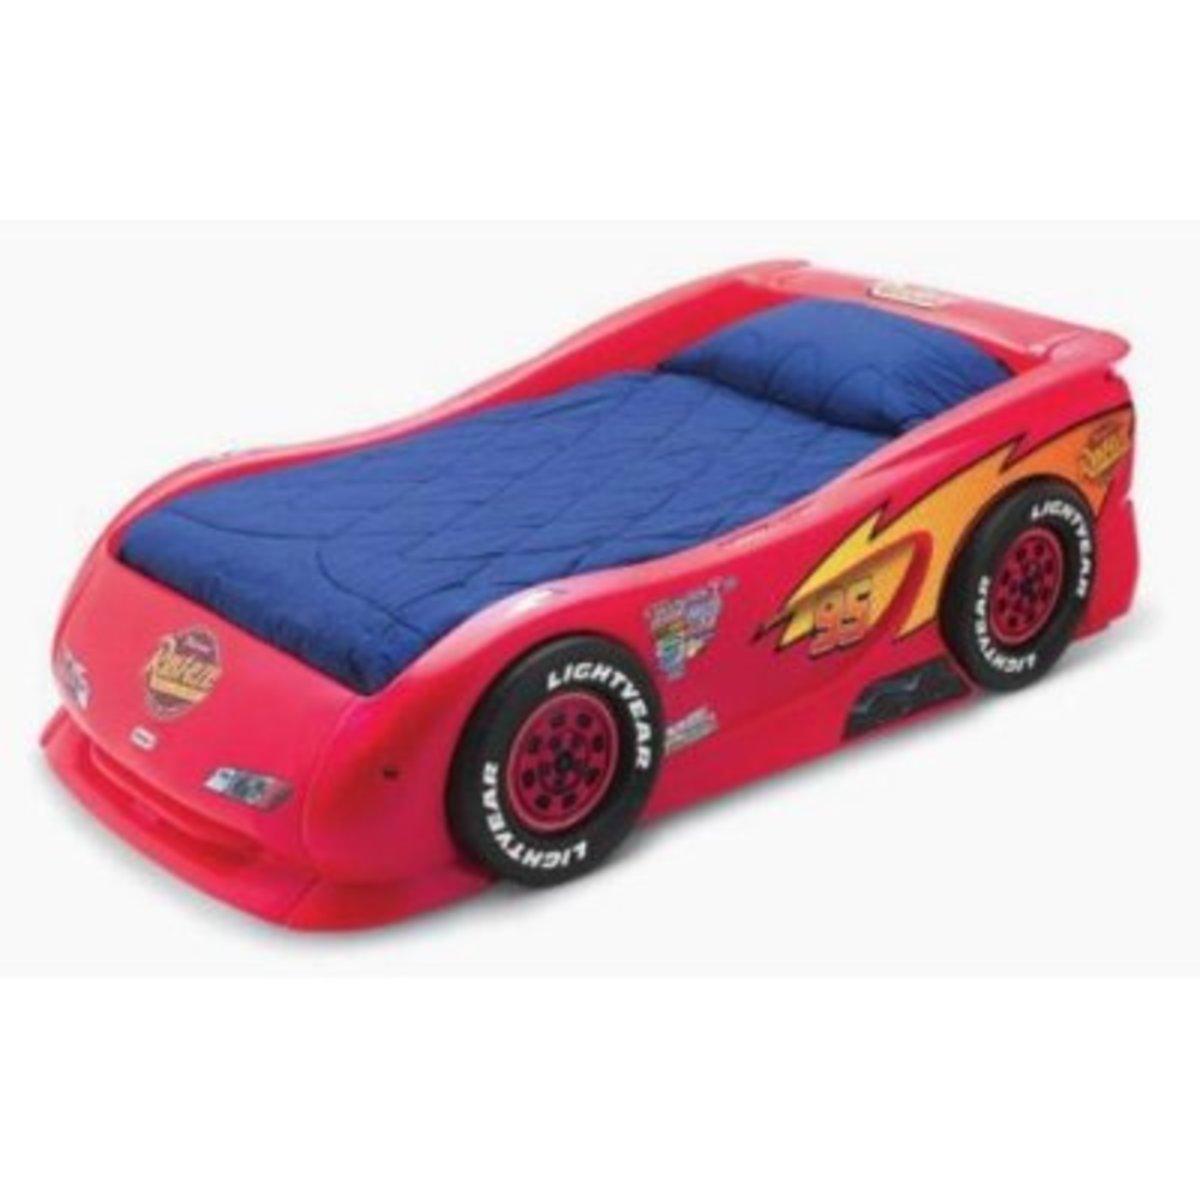 Little Tikes Lightning McQueen Race Car Twin Bed